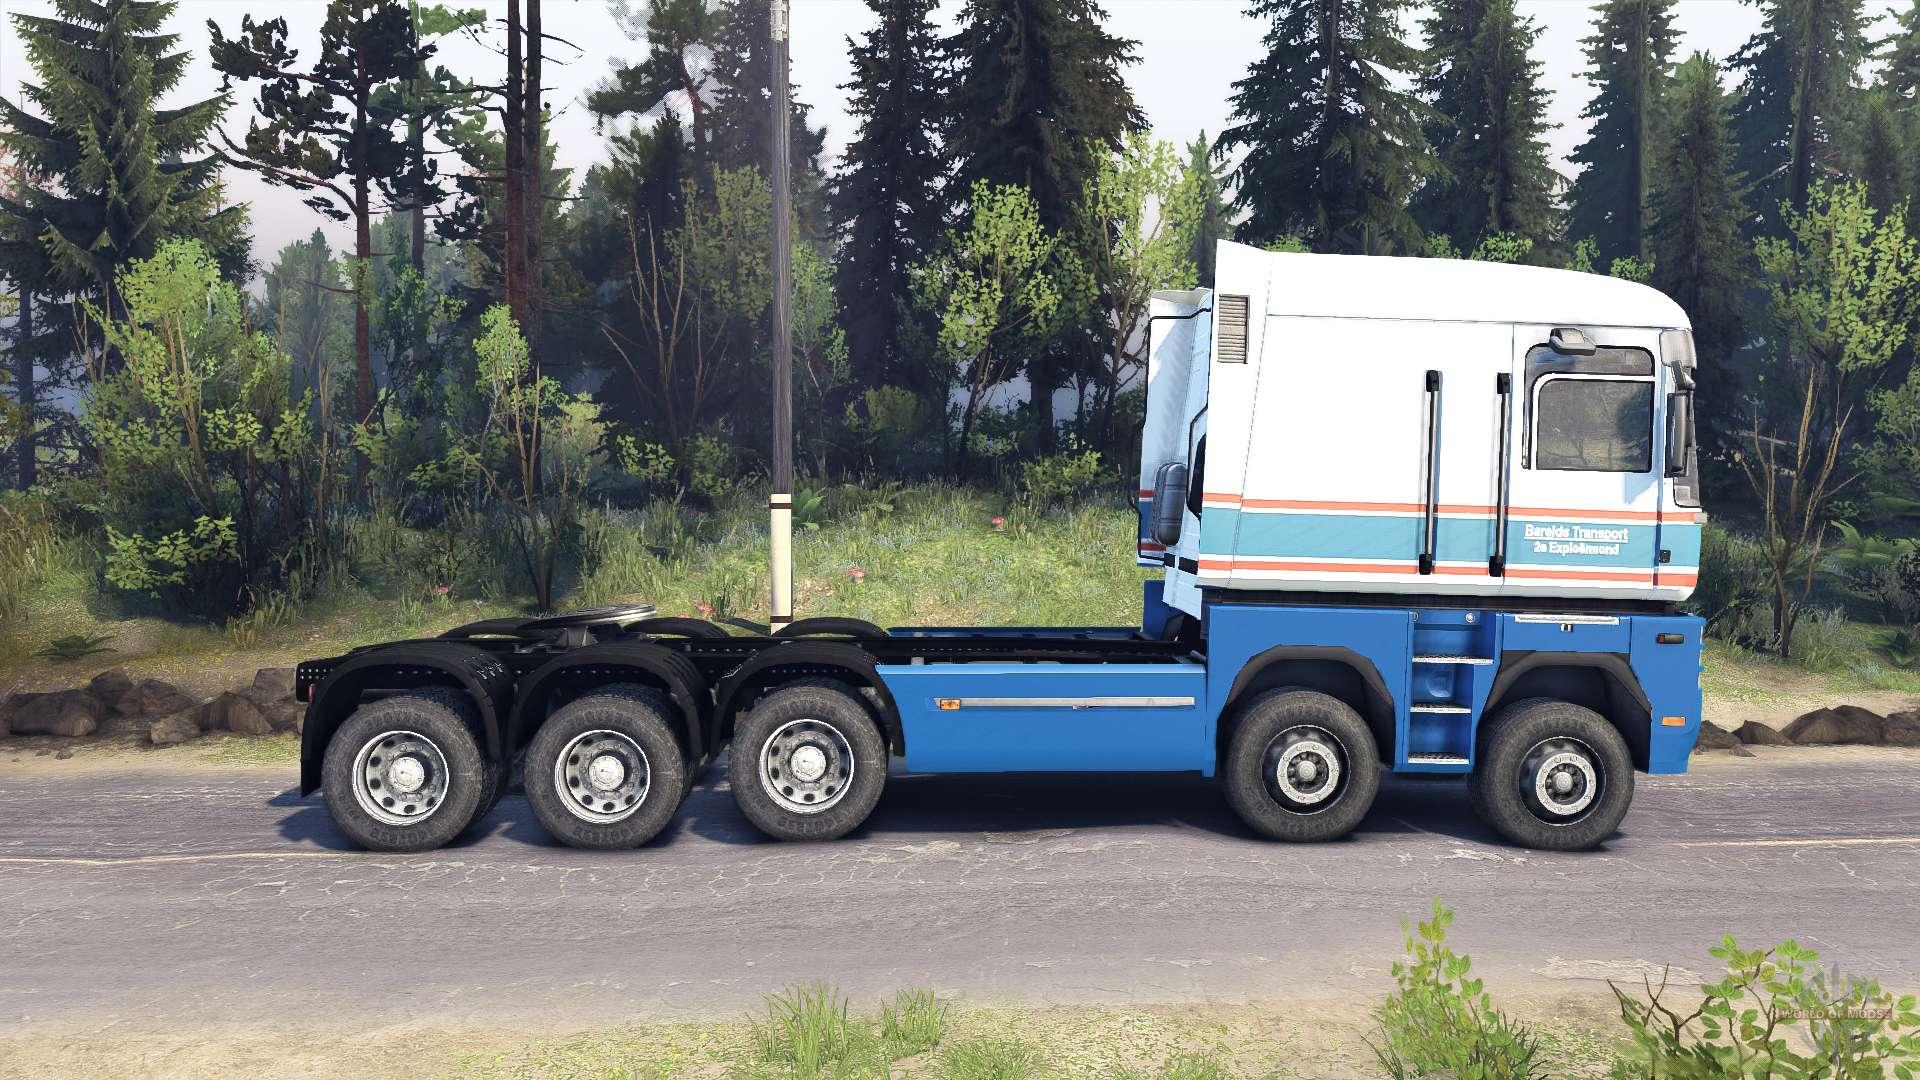 Magnum tuning turbo pdcc fond tert  carbon 2008 also Watch together with Serrridslev Tank Transport Skin For furthermore Renault Magnum besides Limetec Trailer V20. on magnumtuning